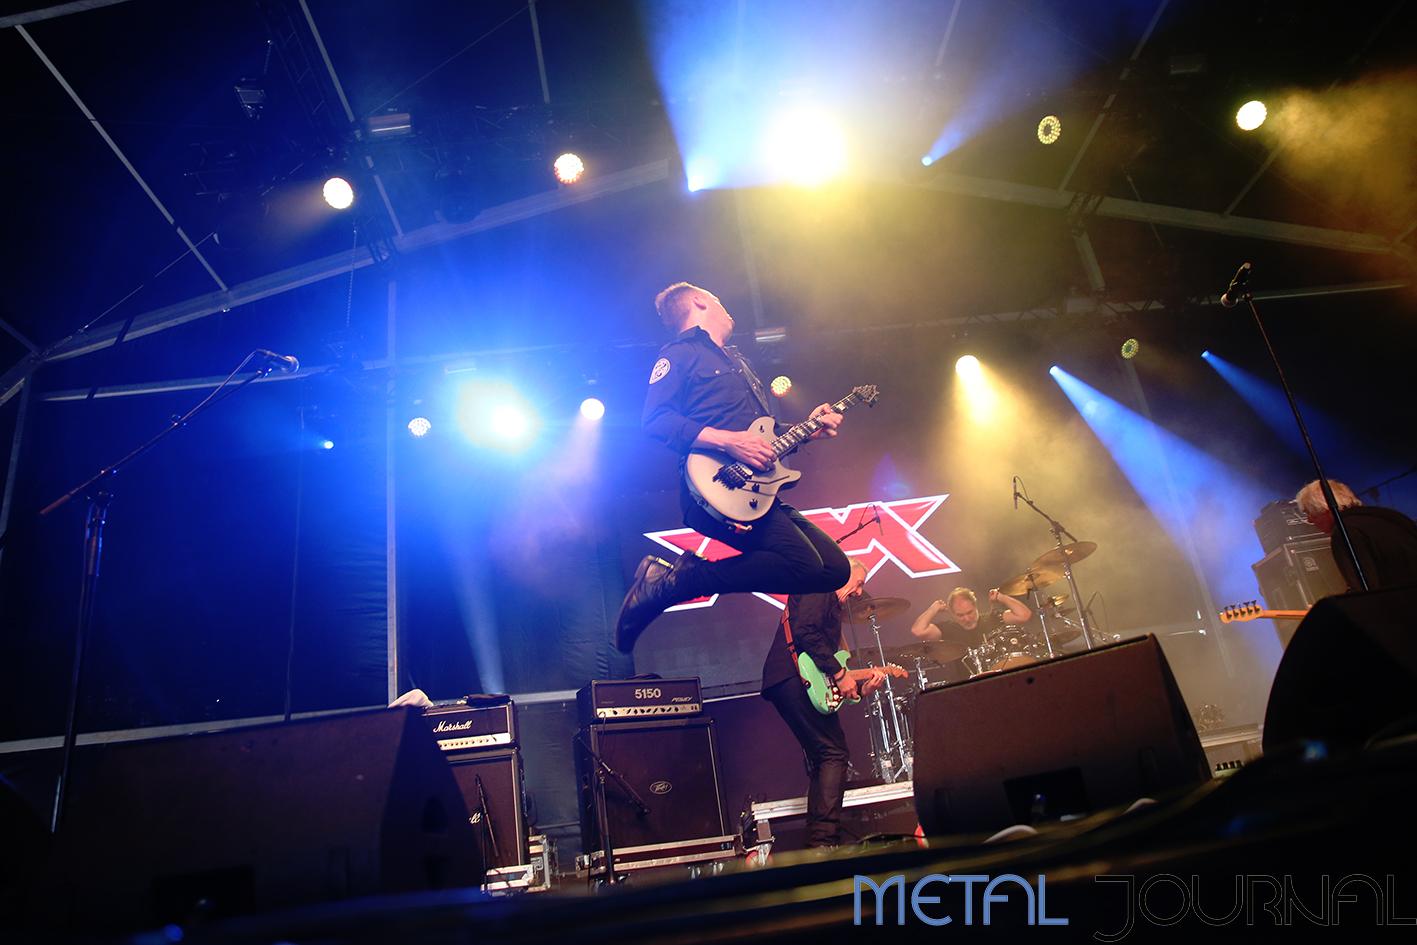 fm - metal journal rock fest barcelona 2019 pic 1